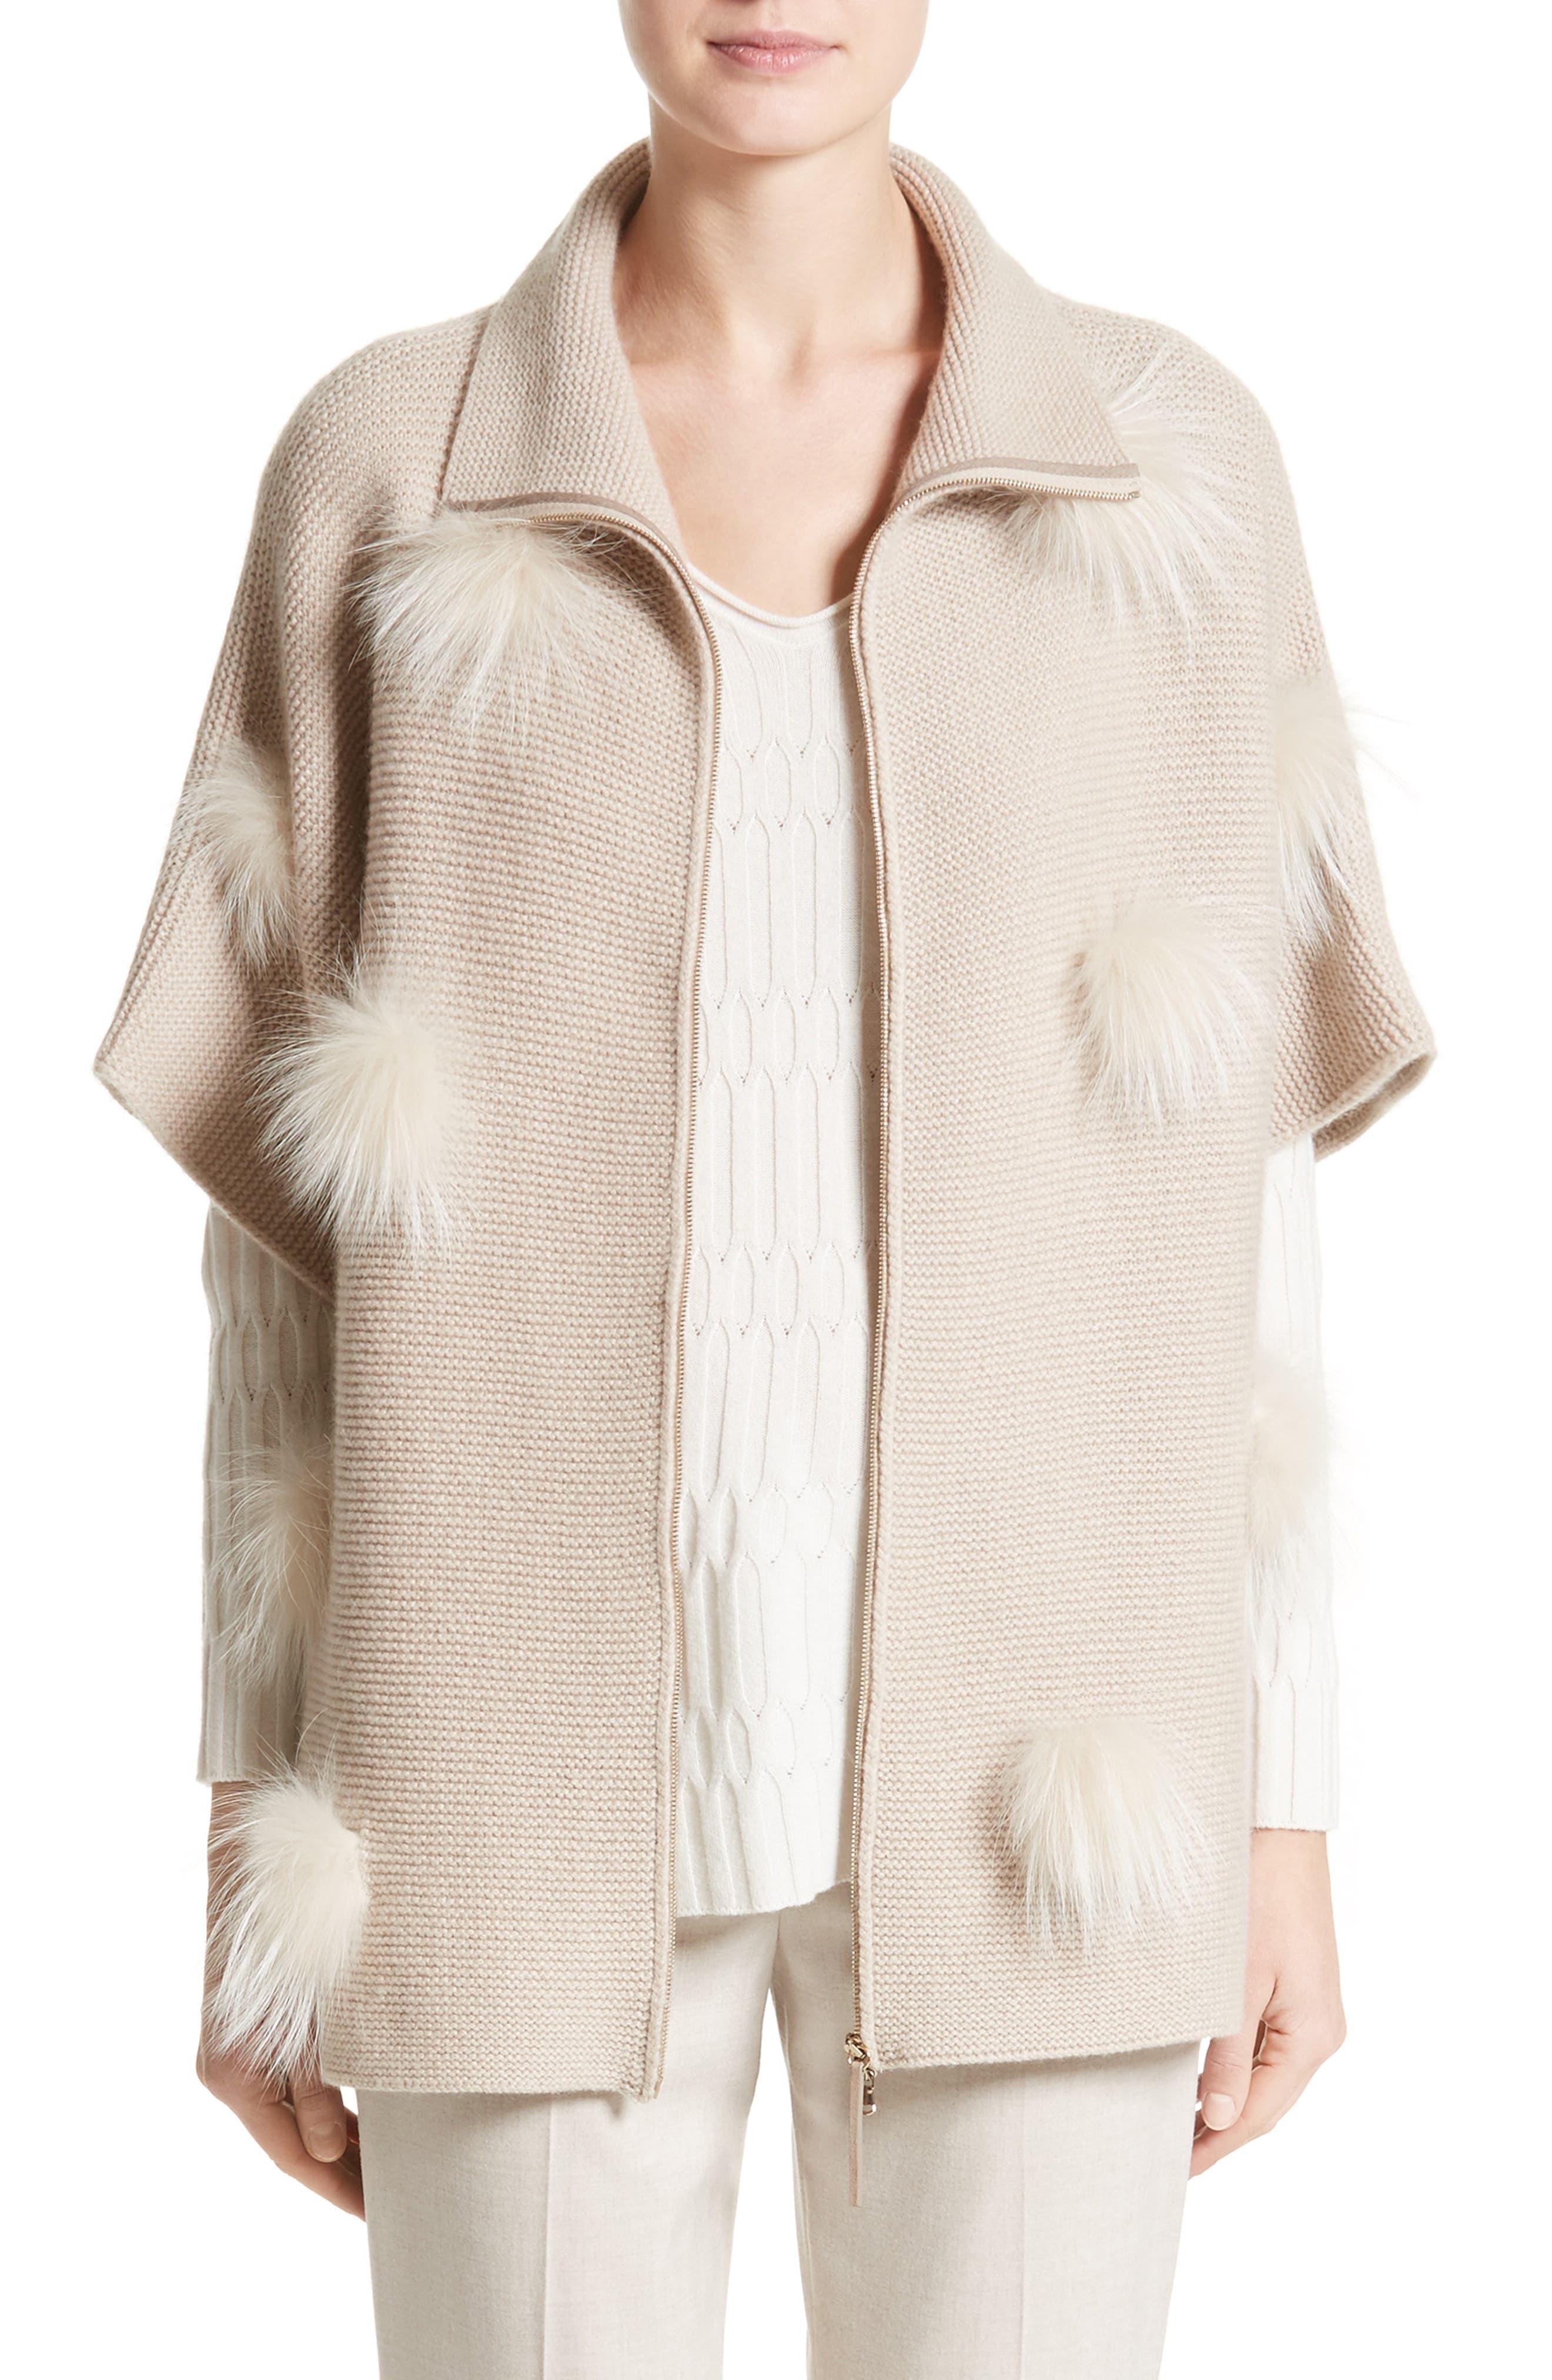 Micro Braid Cashmere Zip Cardigan with Genuine Fox Fur Trim,                         Main,                         color, 101